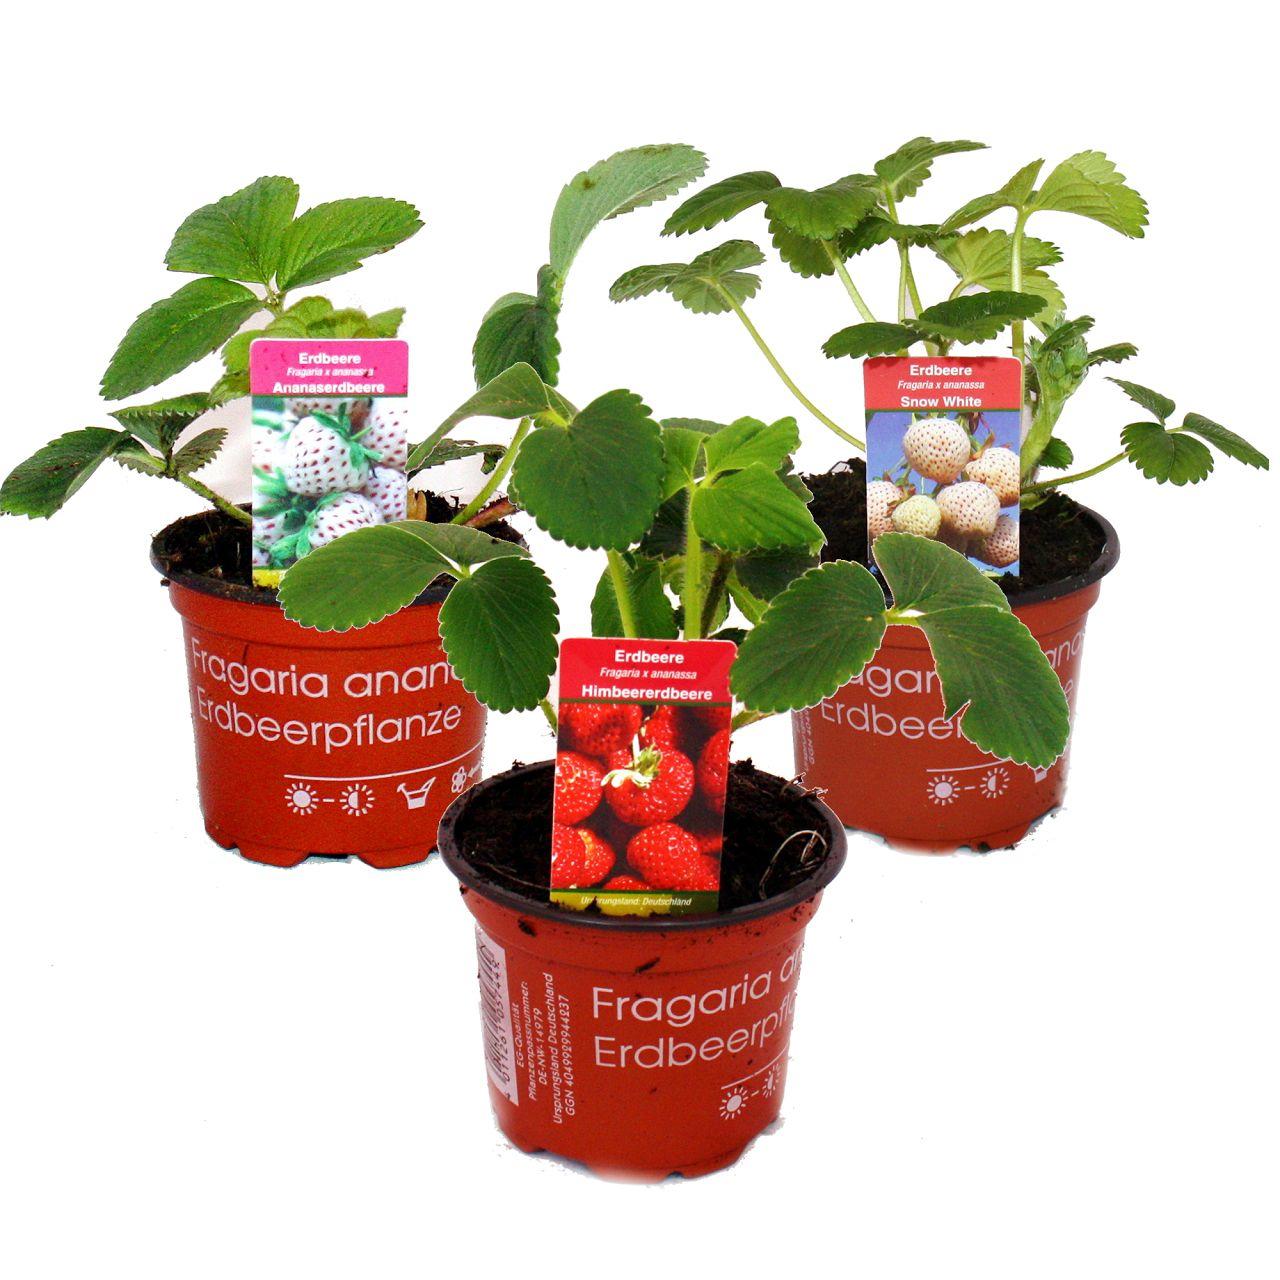 ausgefallene erdbeer sorten 3 pflanzen weisse ananas und himbeer erdbeere ebay. Black Bedroom Furniture Sets. Home Design Ideas